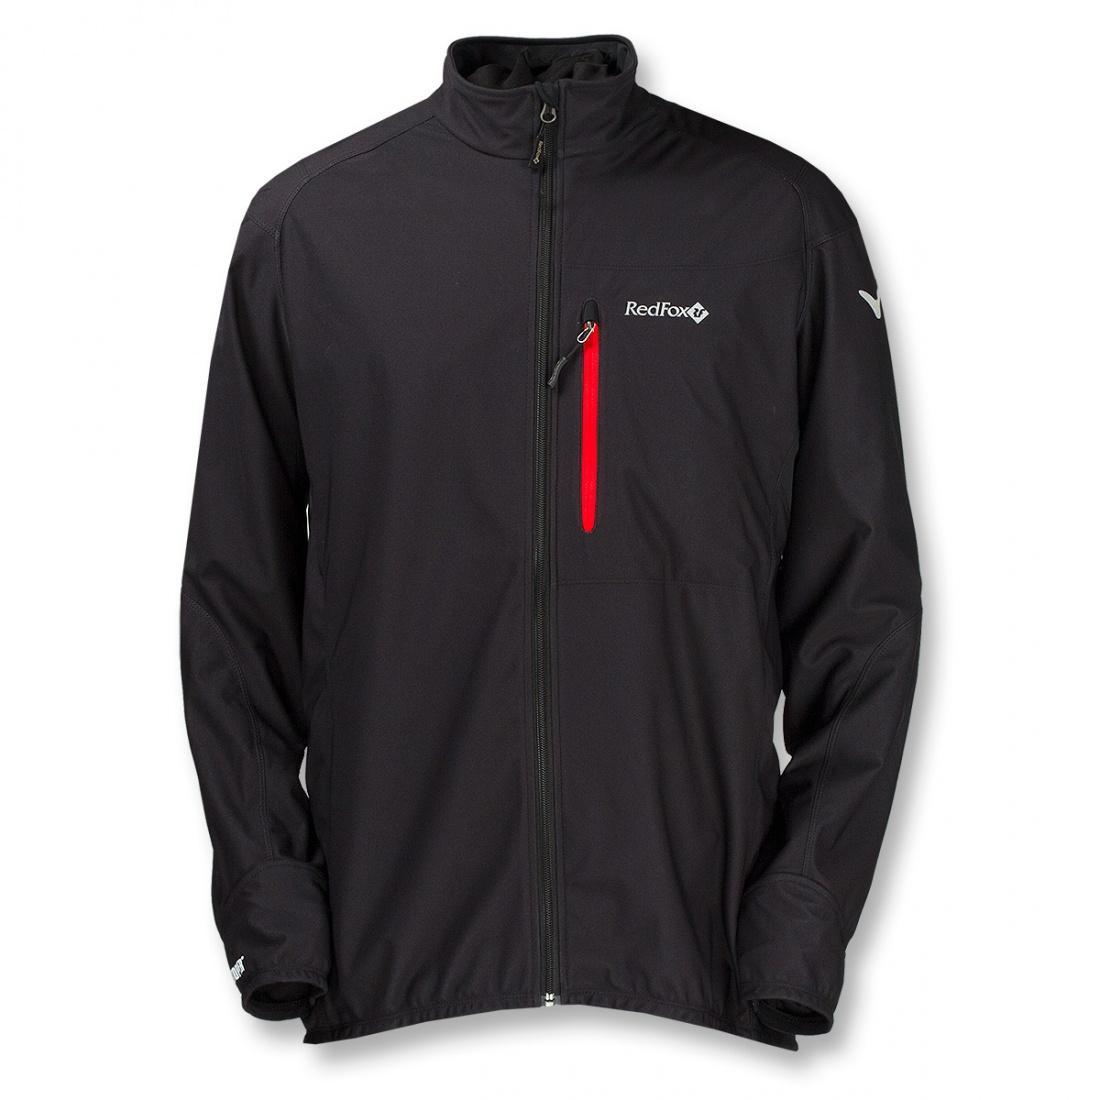 Куртка Active Shell МужскаяКуртки<br><br><br>Цвет: Черный<br>Размер: 54